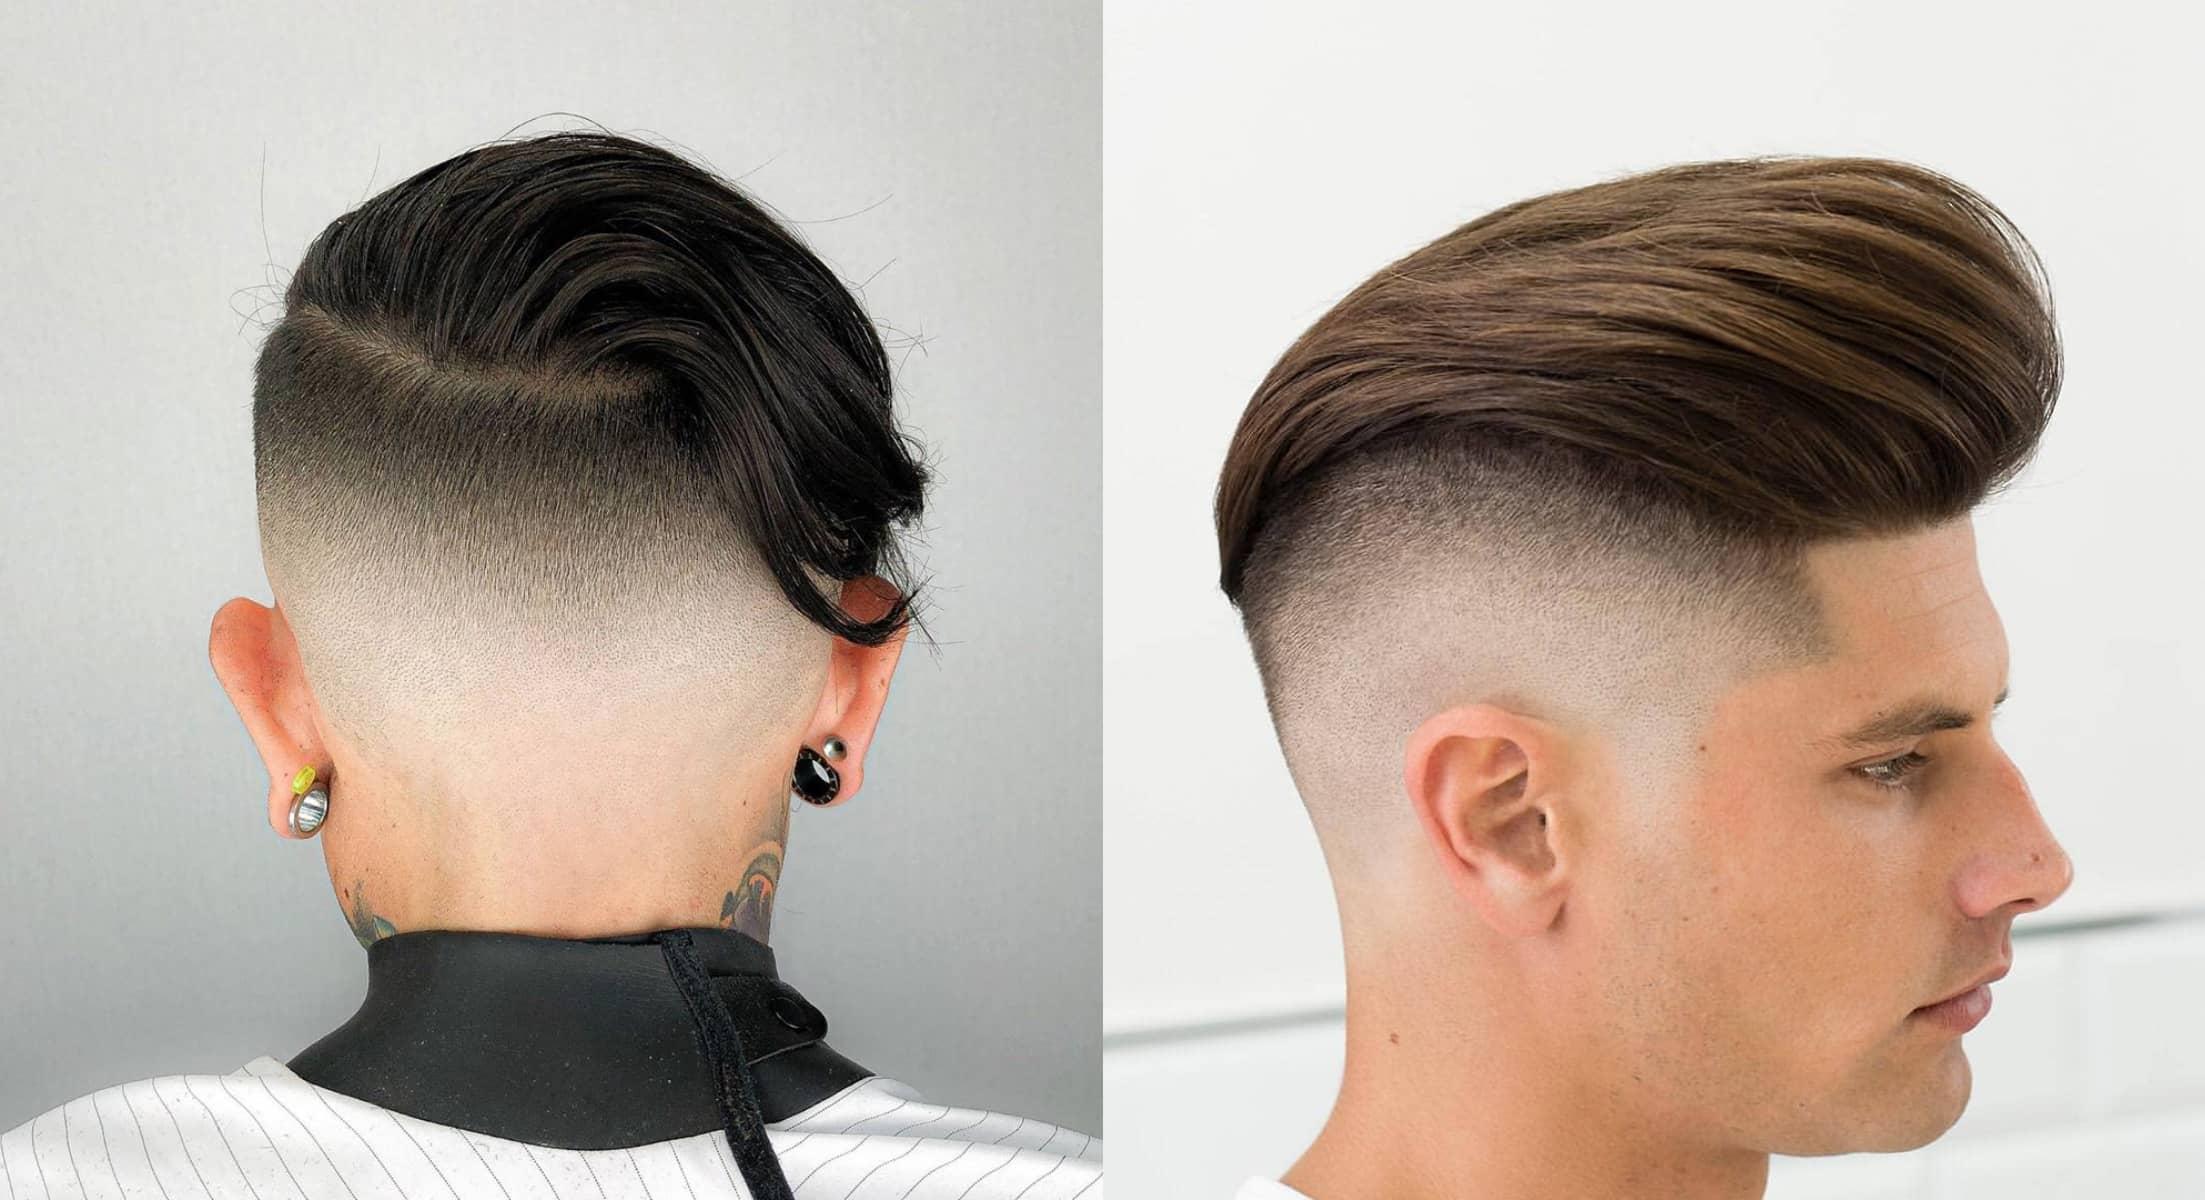 20 Classic Undercut Hairstyles For Men